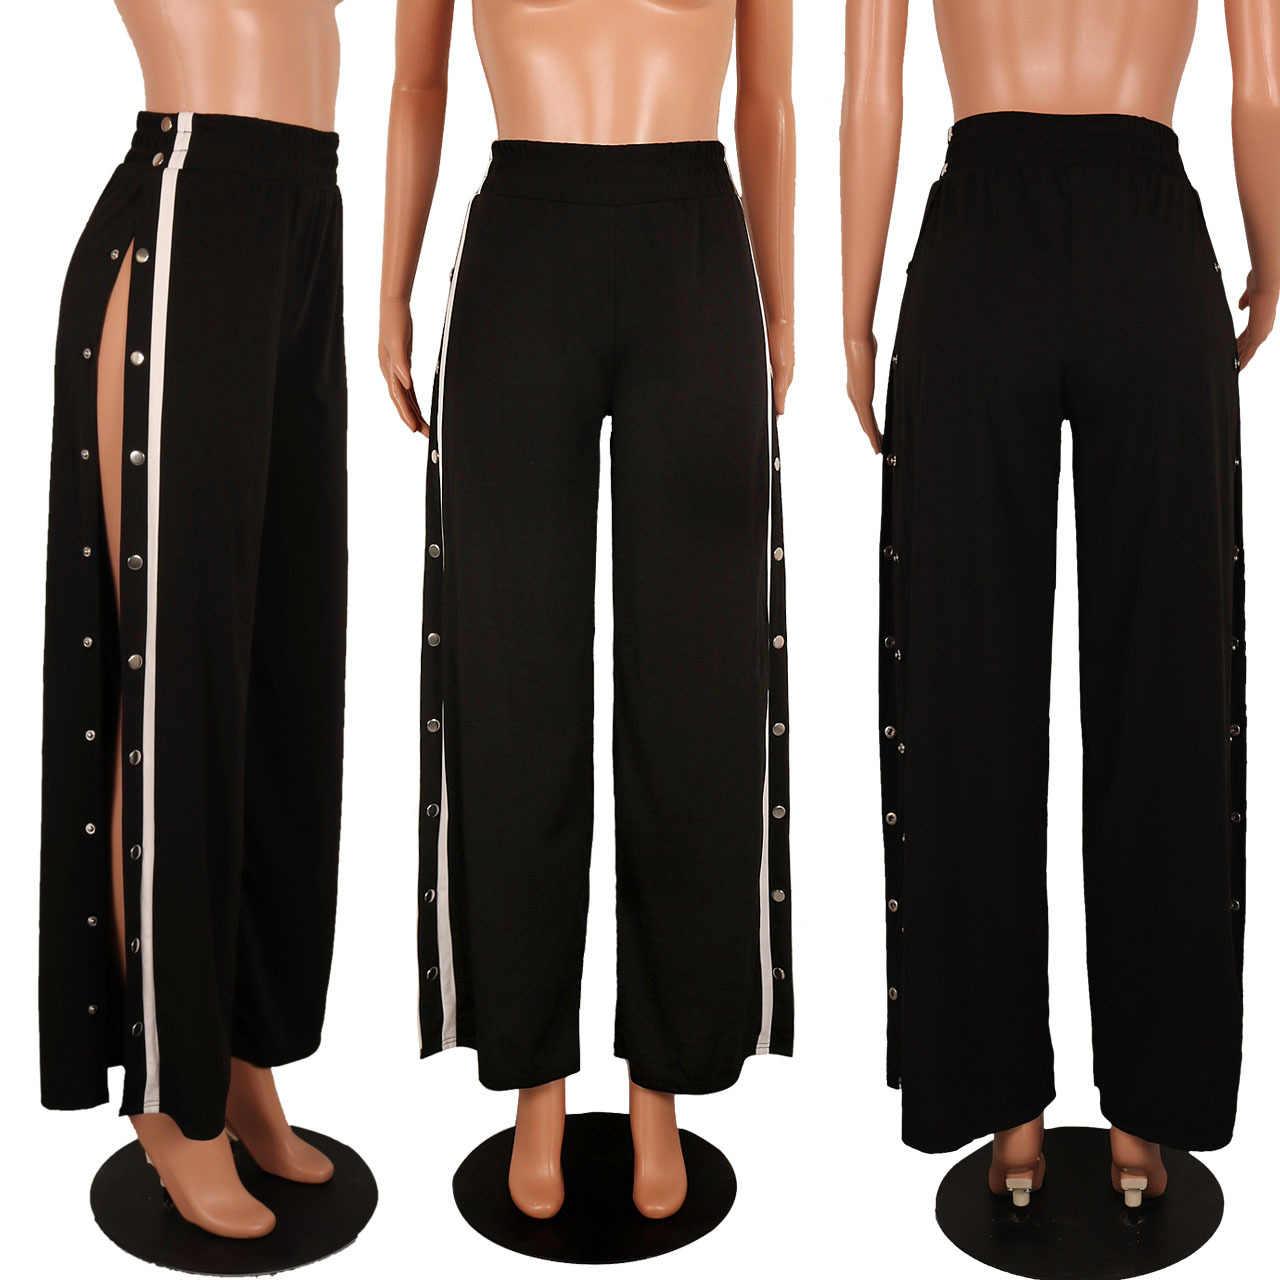 Beauty fashion rivet buckle striped split casual pants